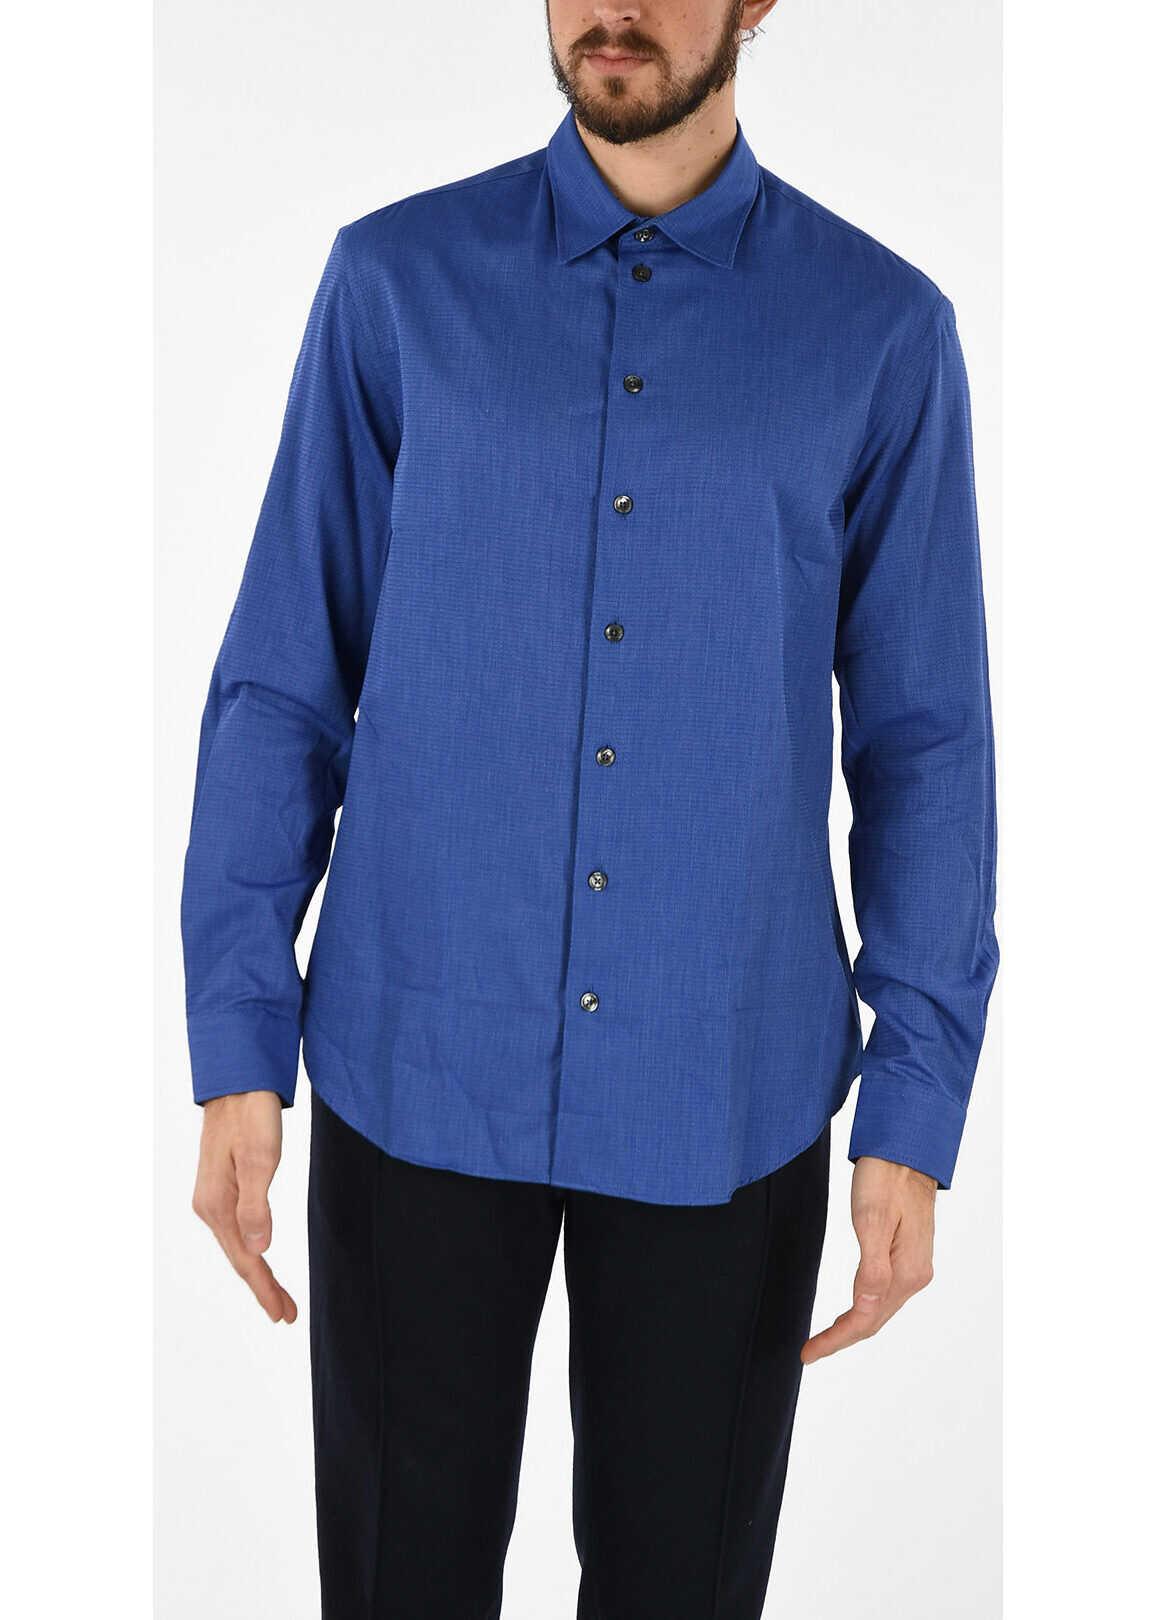 Armani Cotton Popeline Shirt BLUE